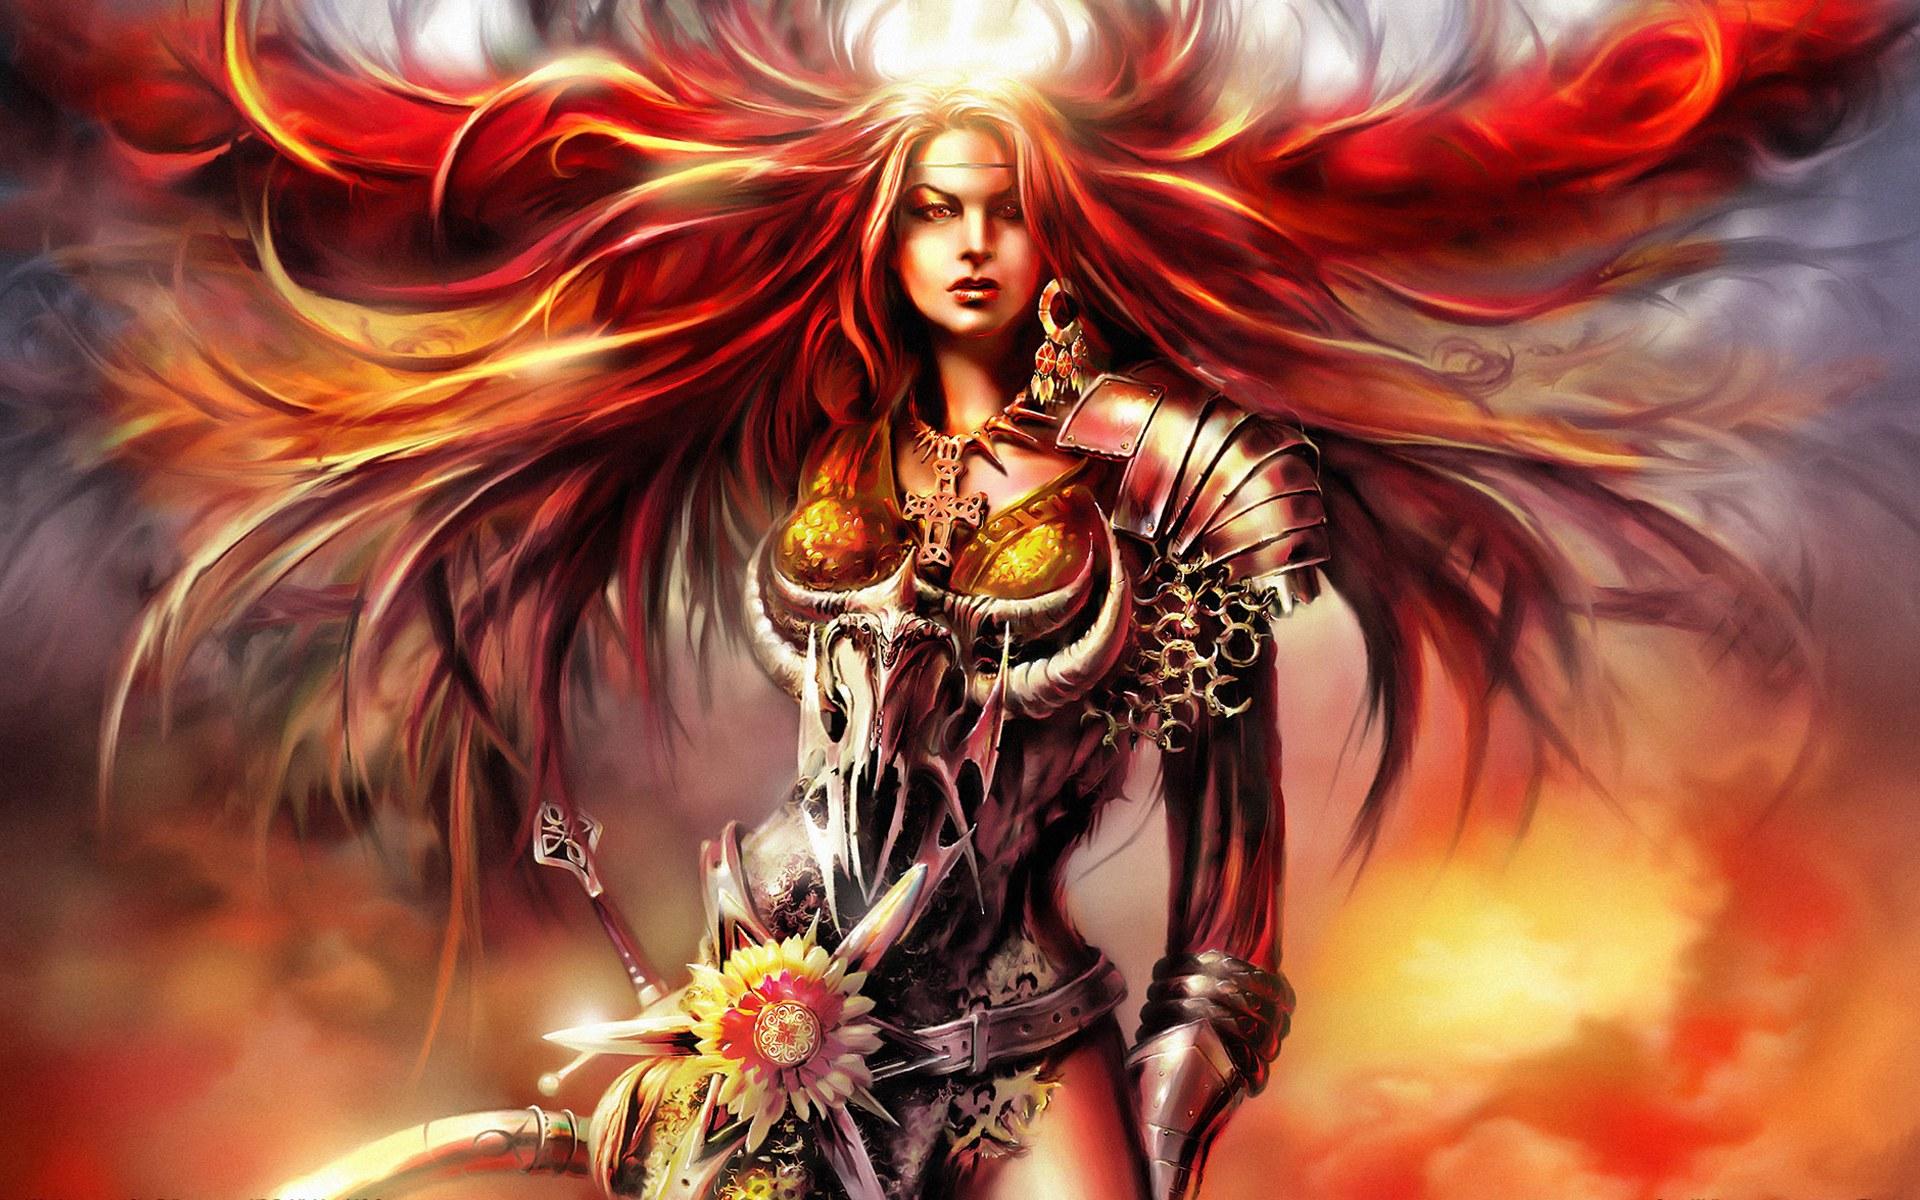 ws_Fantasy_girl_-_Warrior_1920x1200.jpg